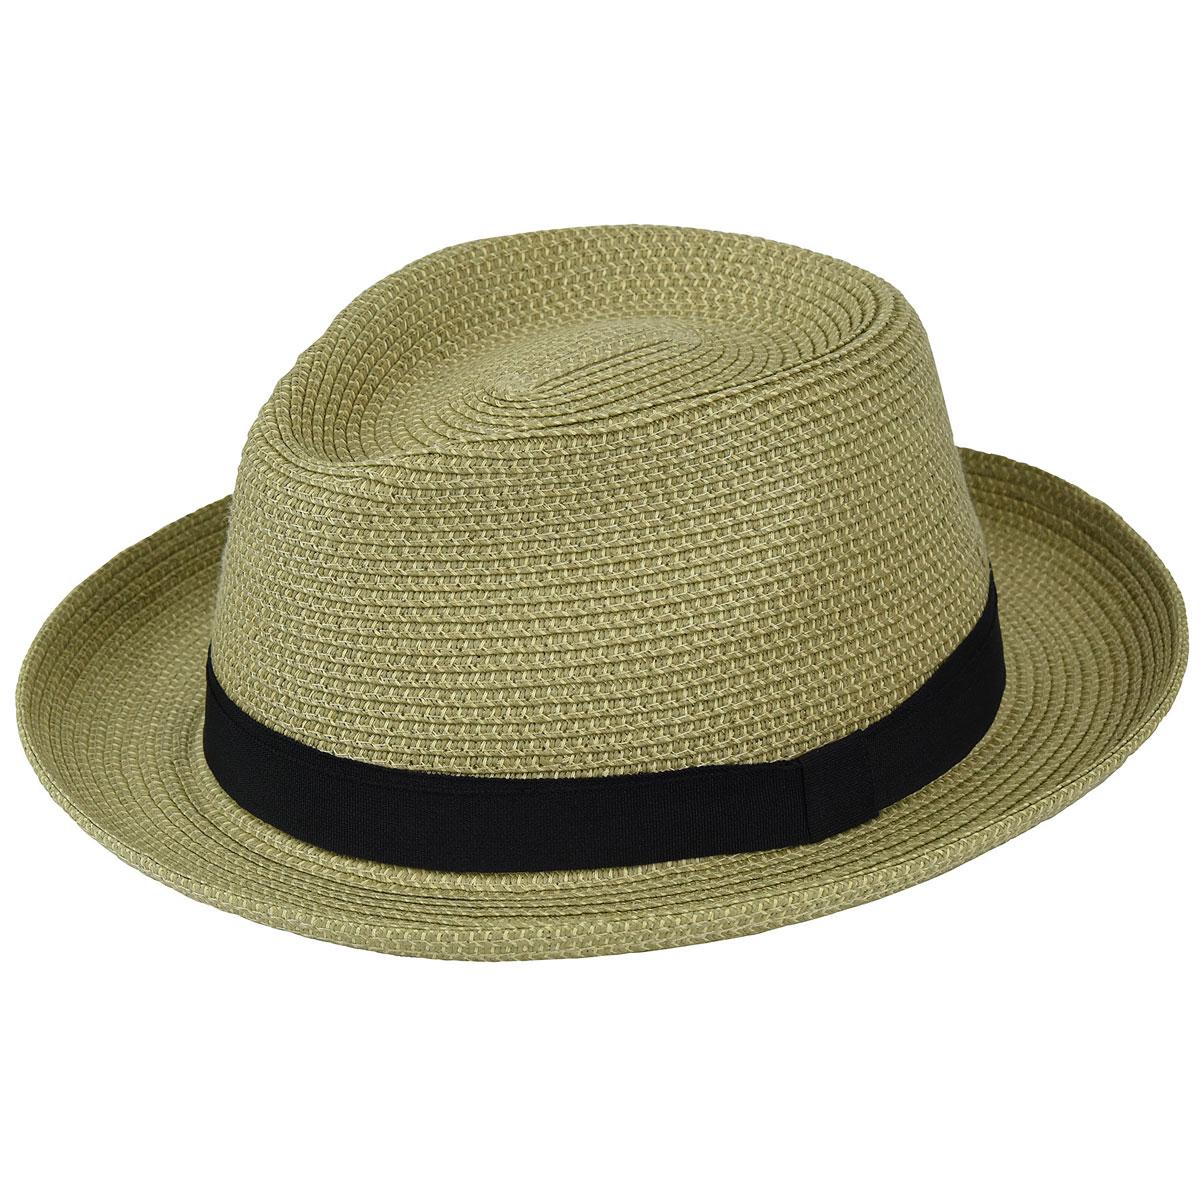 1940s Mens Hats | Fedora, Homburg, Pork Pie Hats Tomlin Fedora $45.00 AT vintagedancer.com